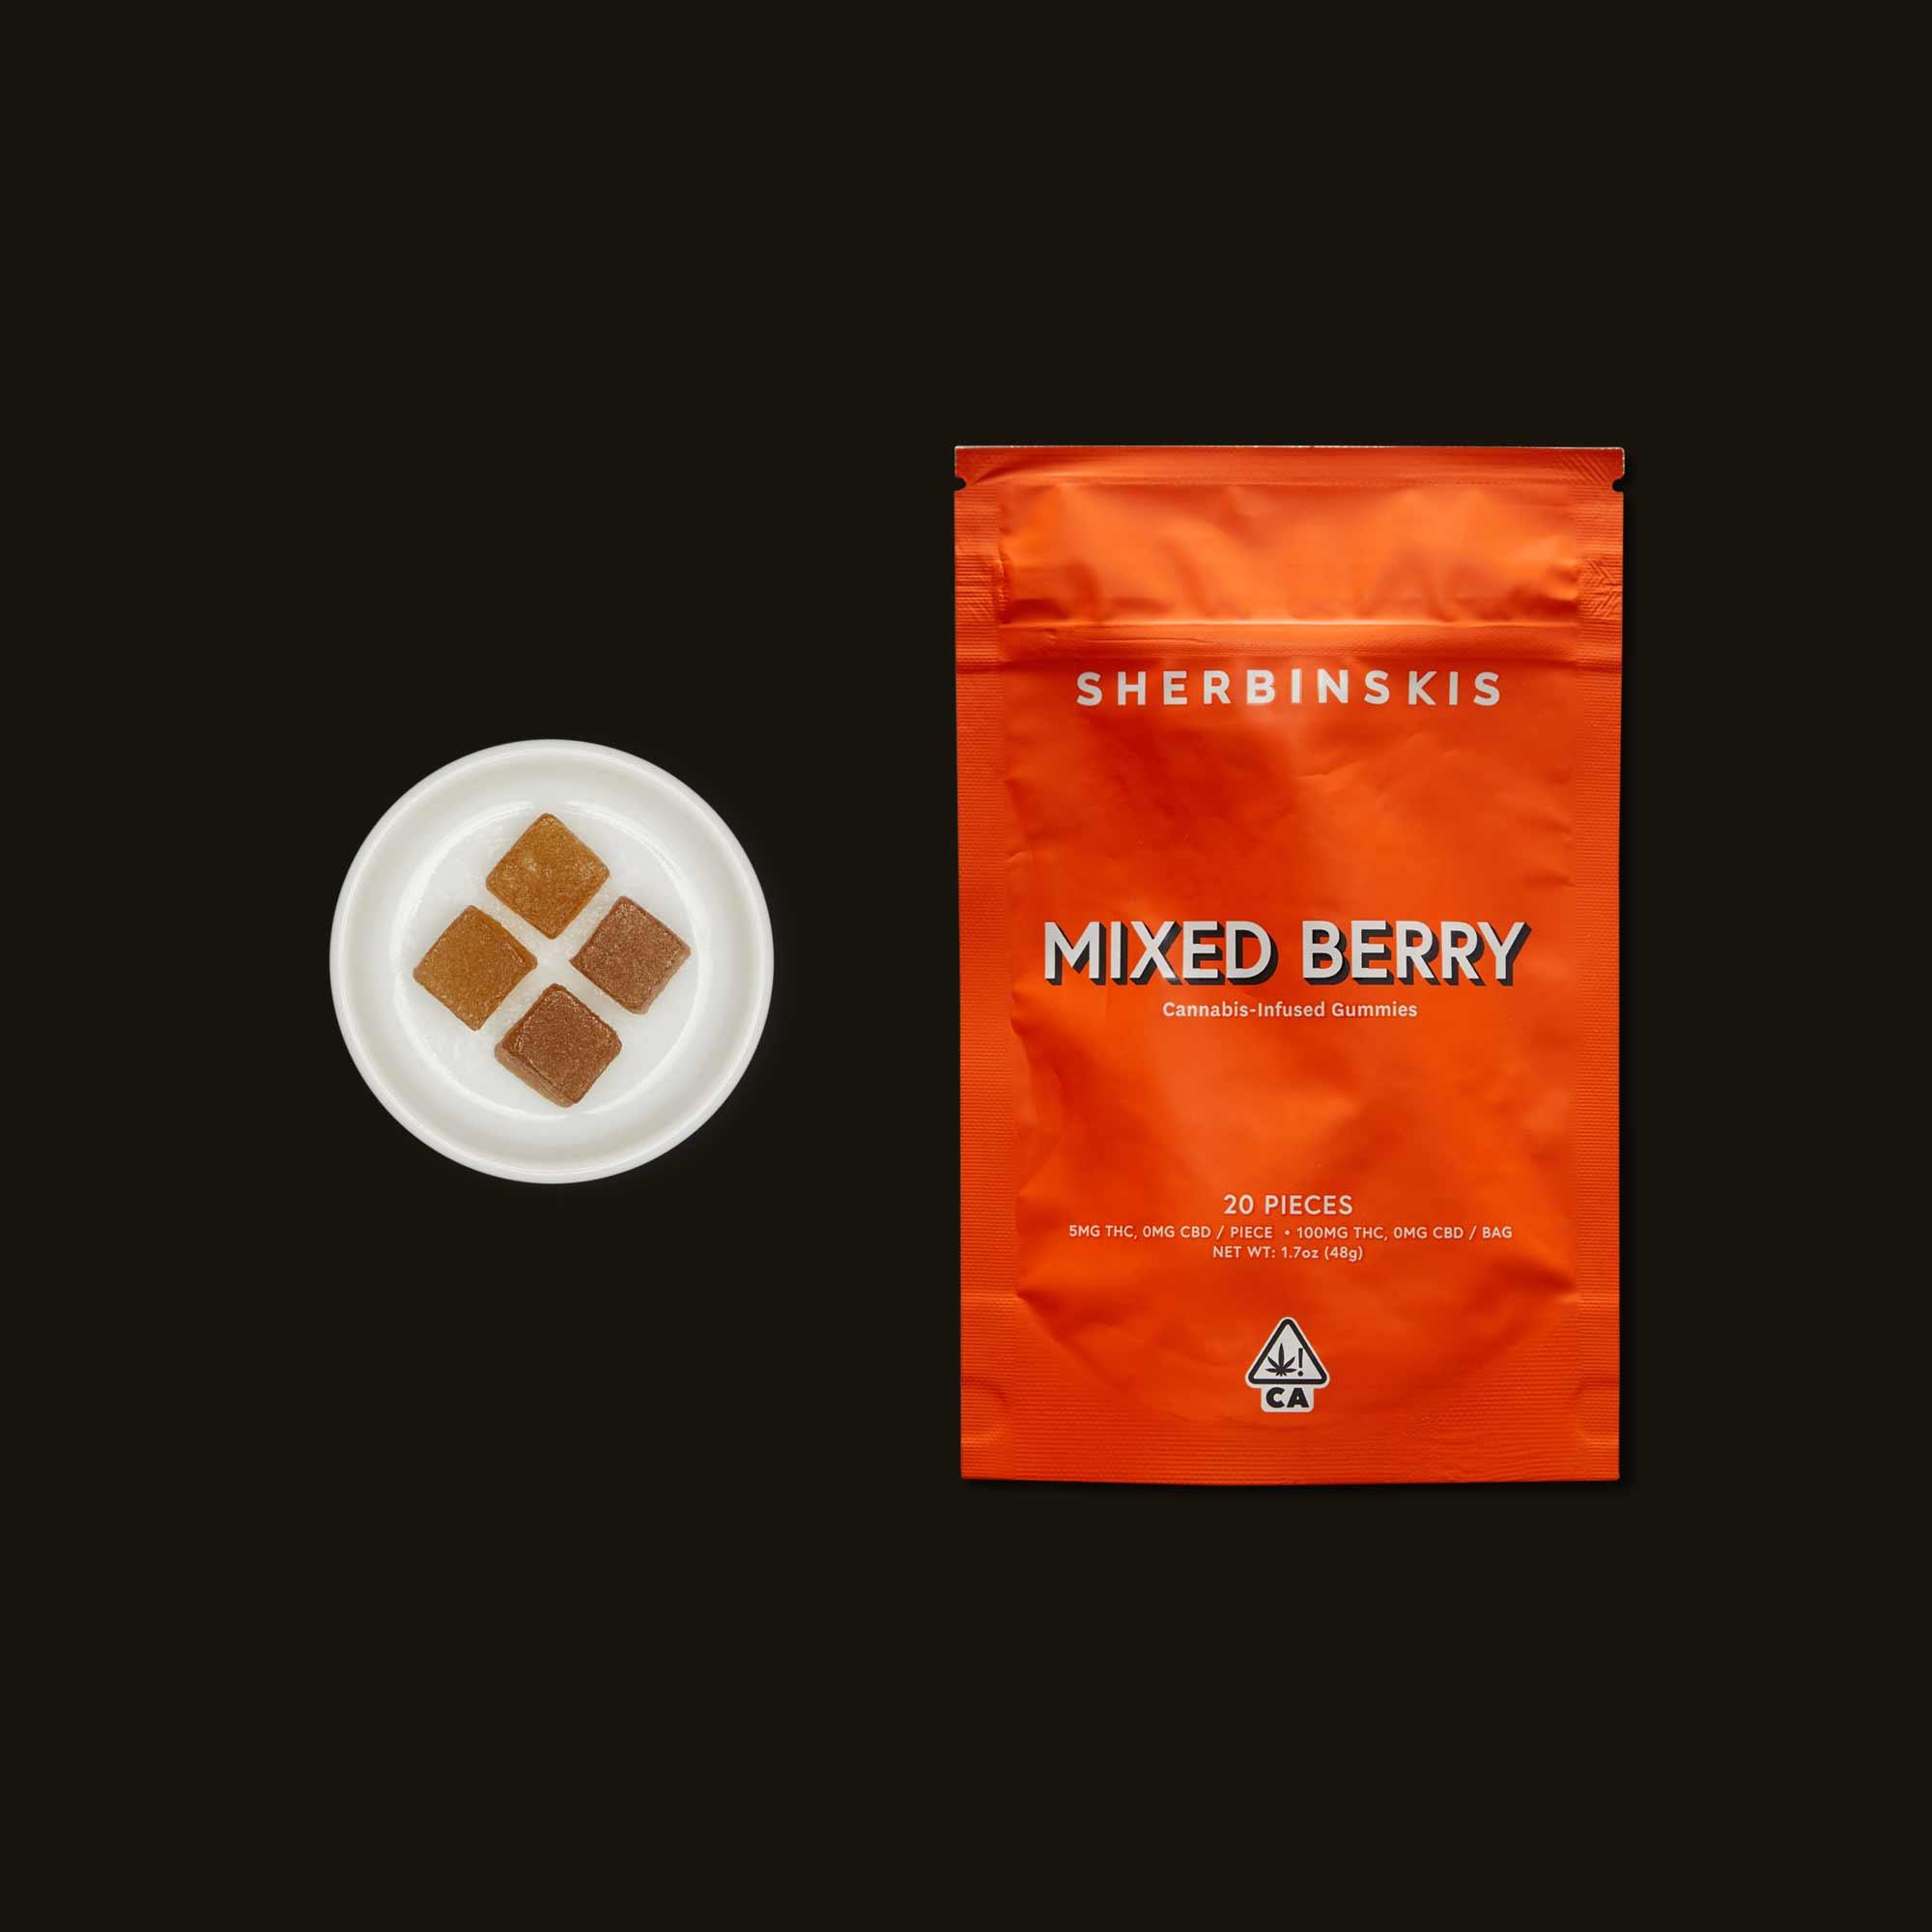 Sherbinskis Mixed Berry Gummies